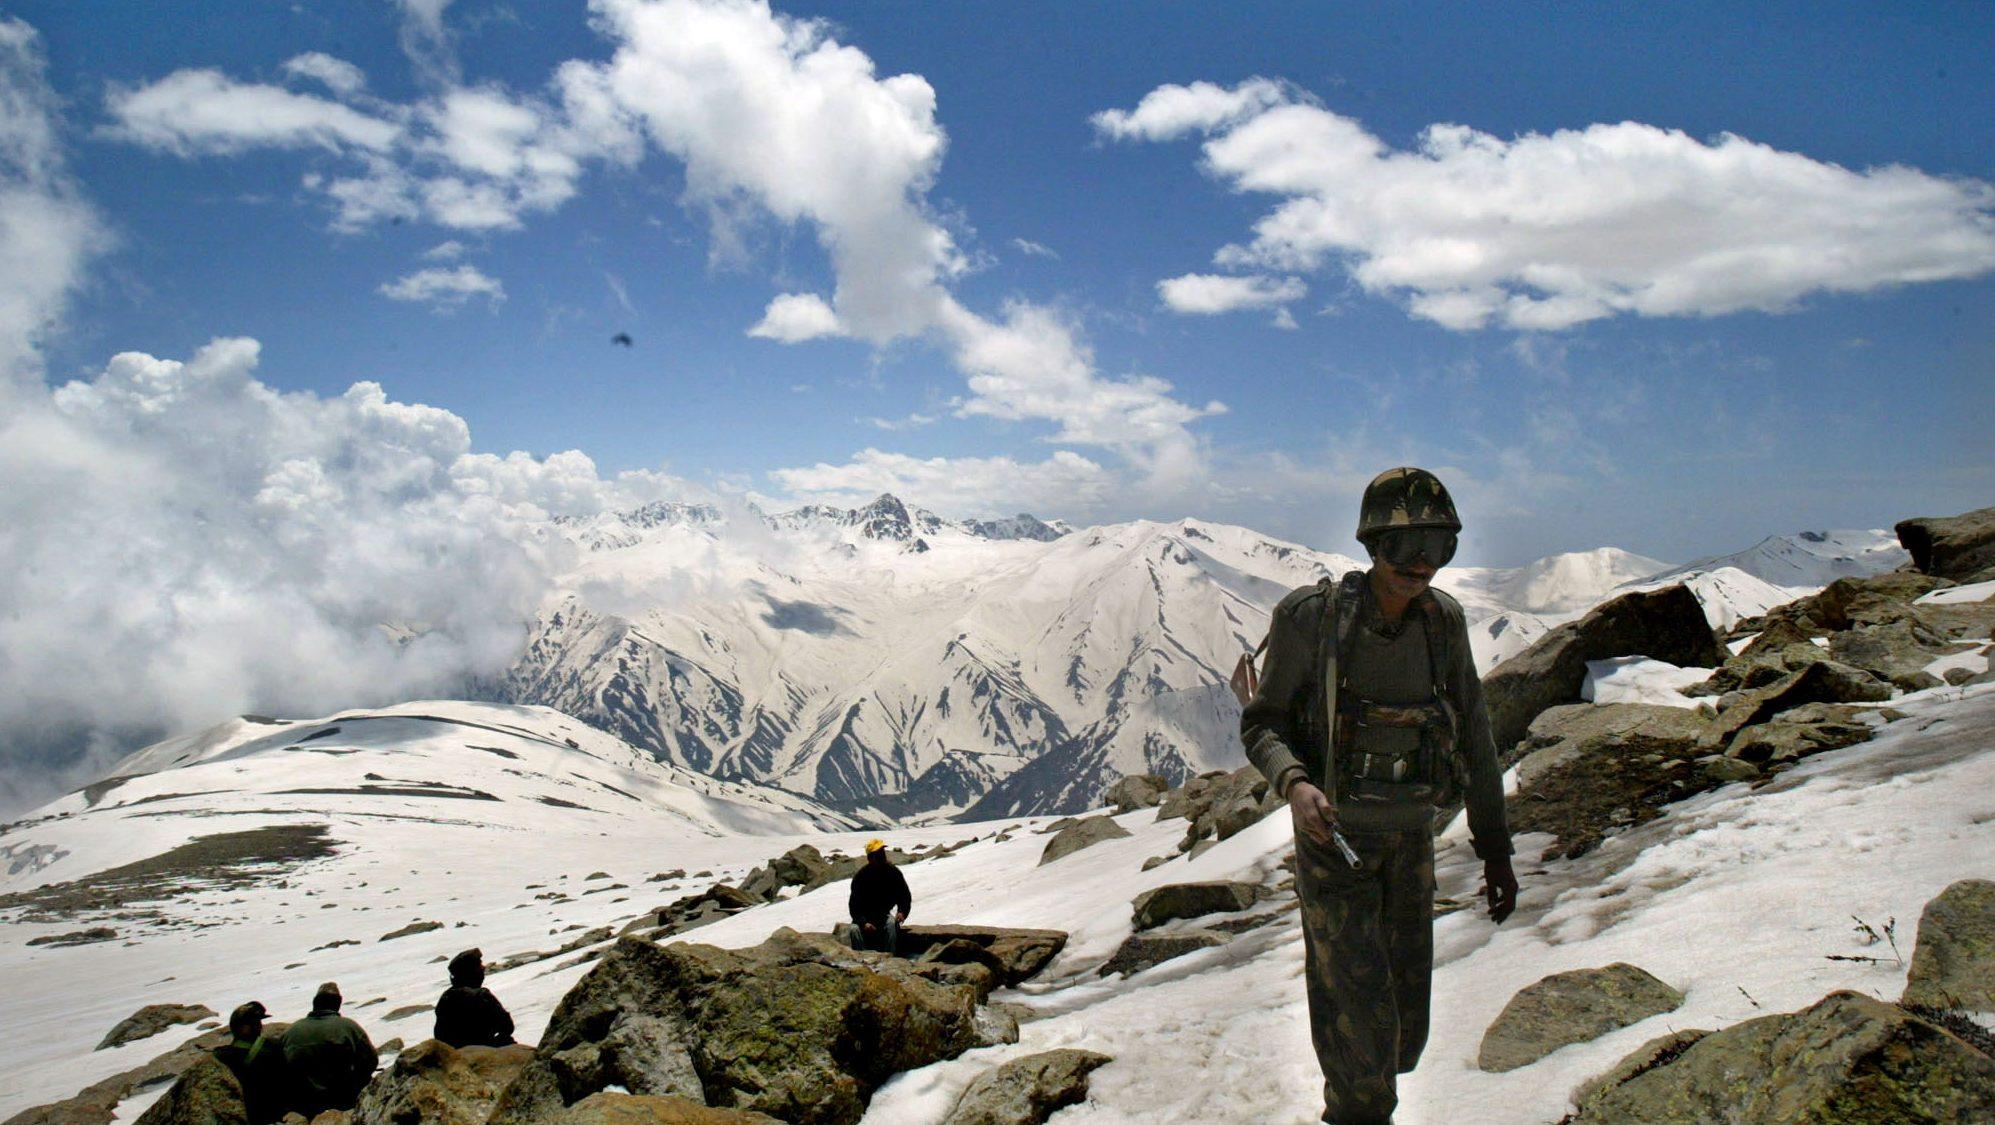 Himmanav, Yeti footprint sighted, Indian Army tweets photos